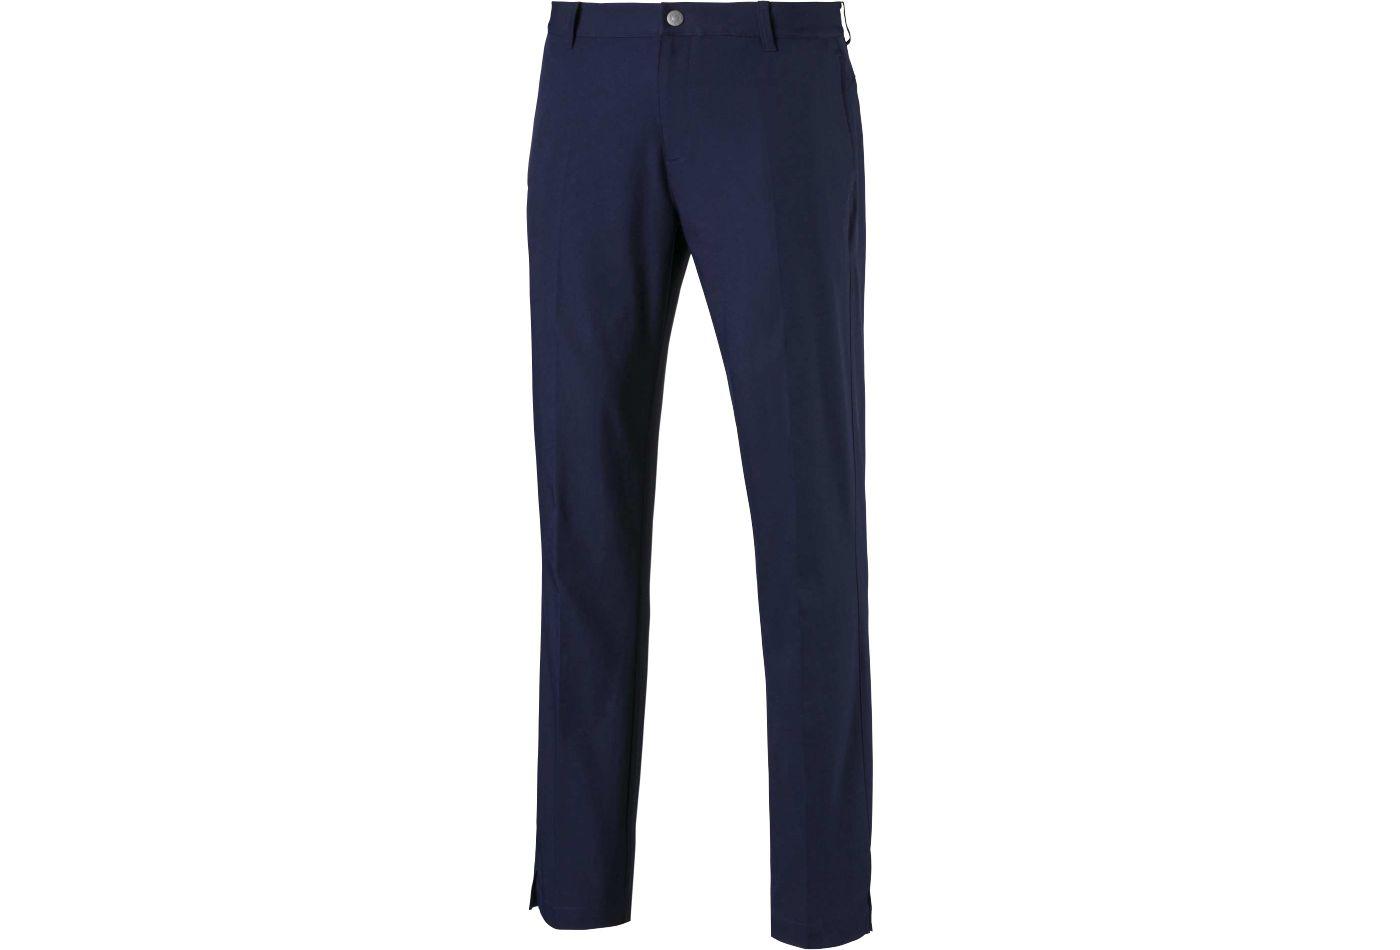 PUMA Men's Jackpot Golf Pants